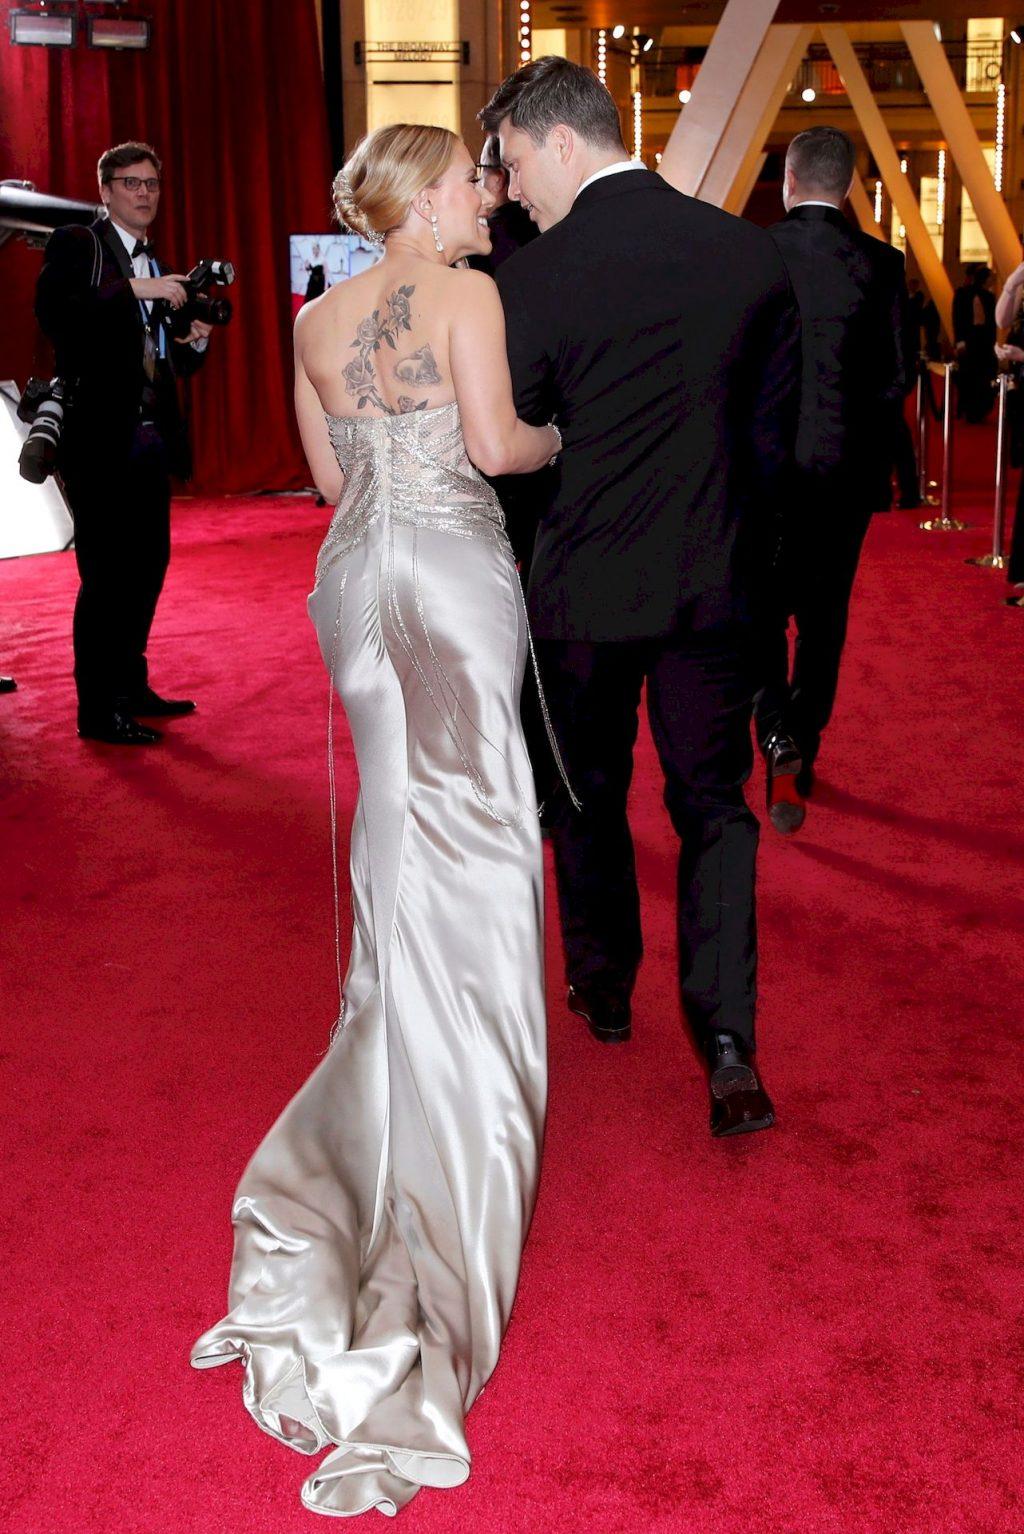 Scarlett Johansson in Oscar de la Renta Poses on the Red Carpet During the Oscars (46 Photos)